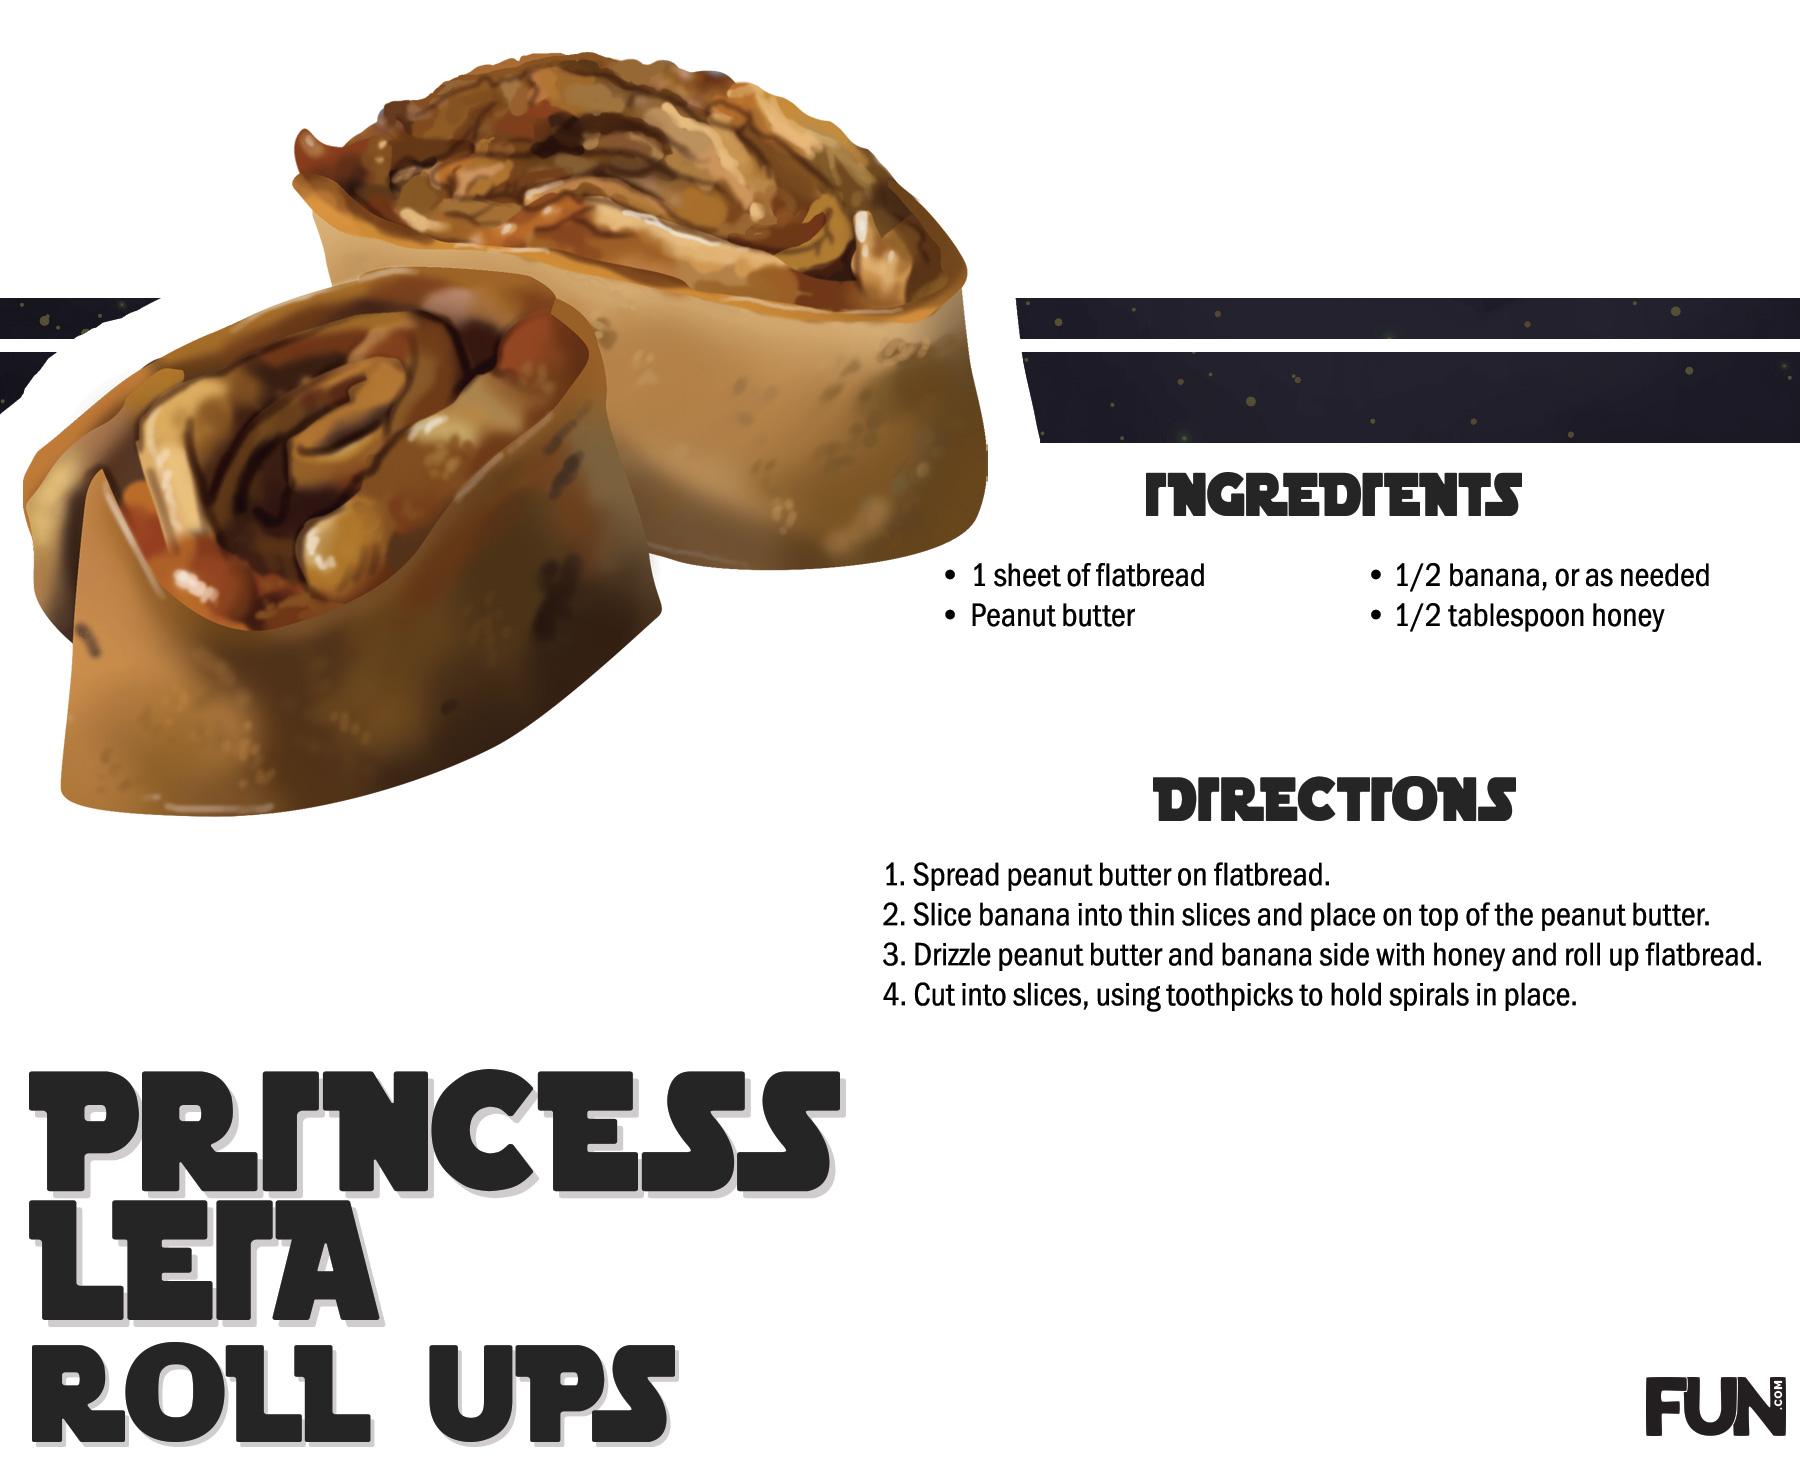 Princess Leia Roll Ups Recipe